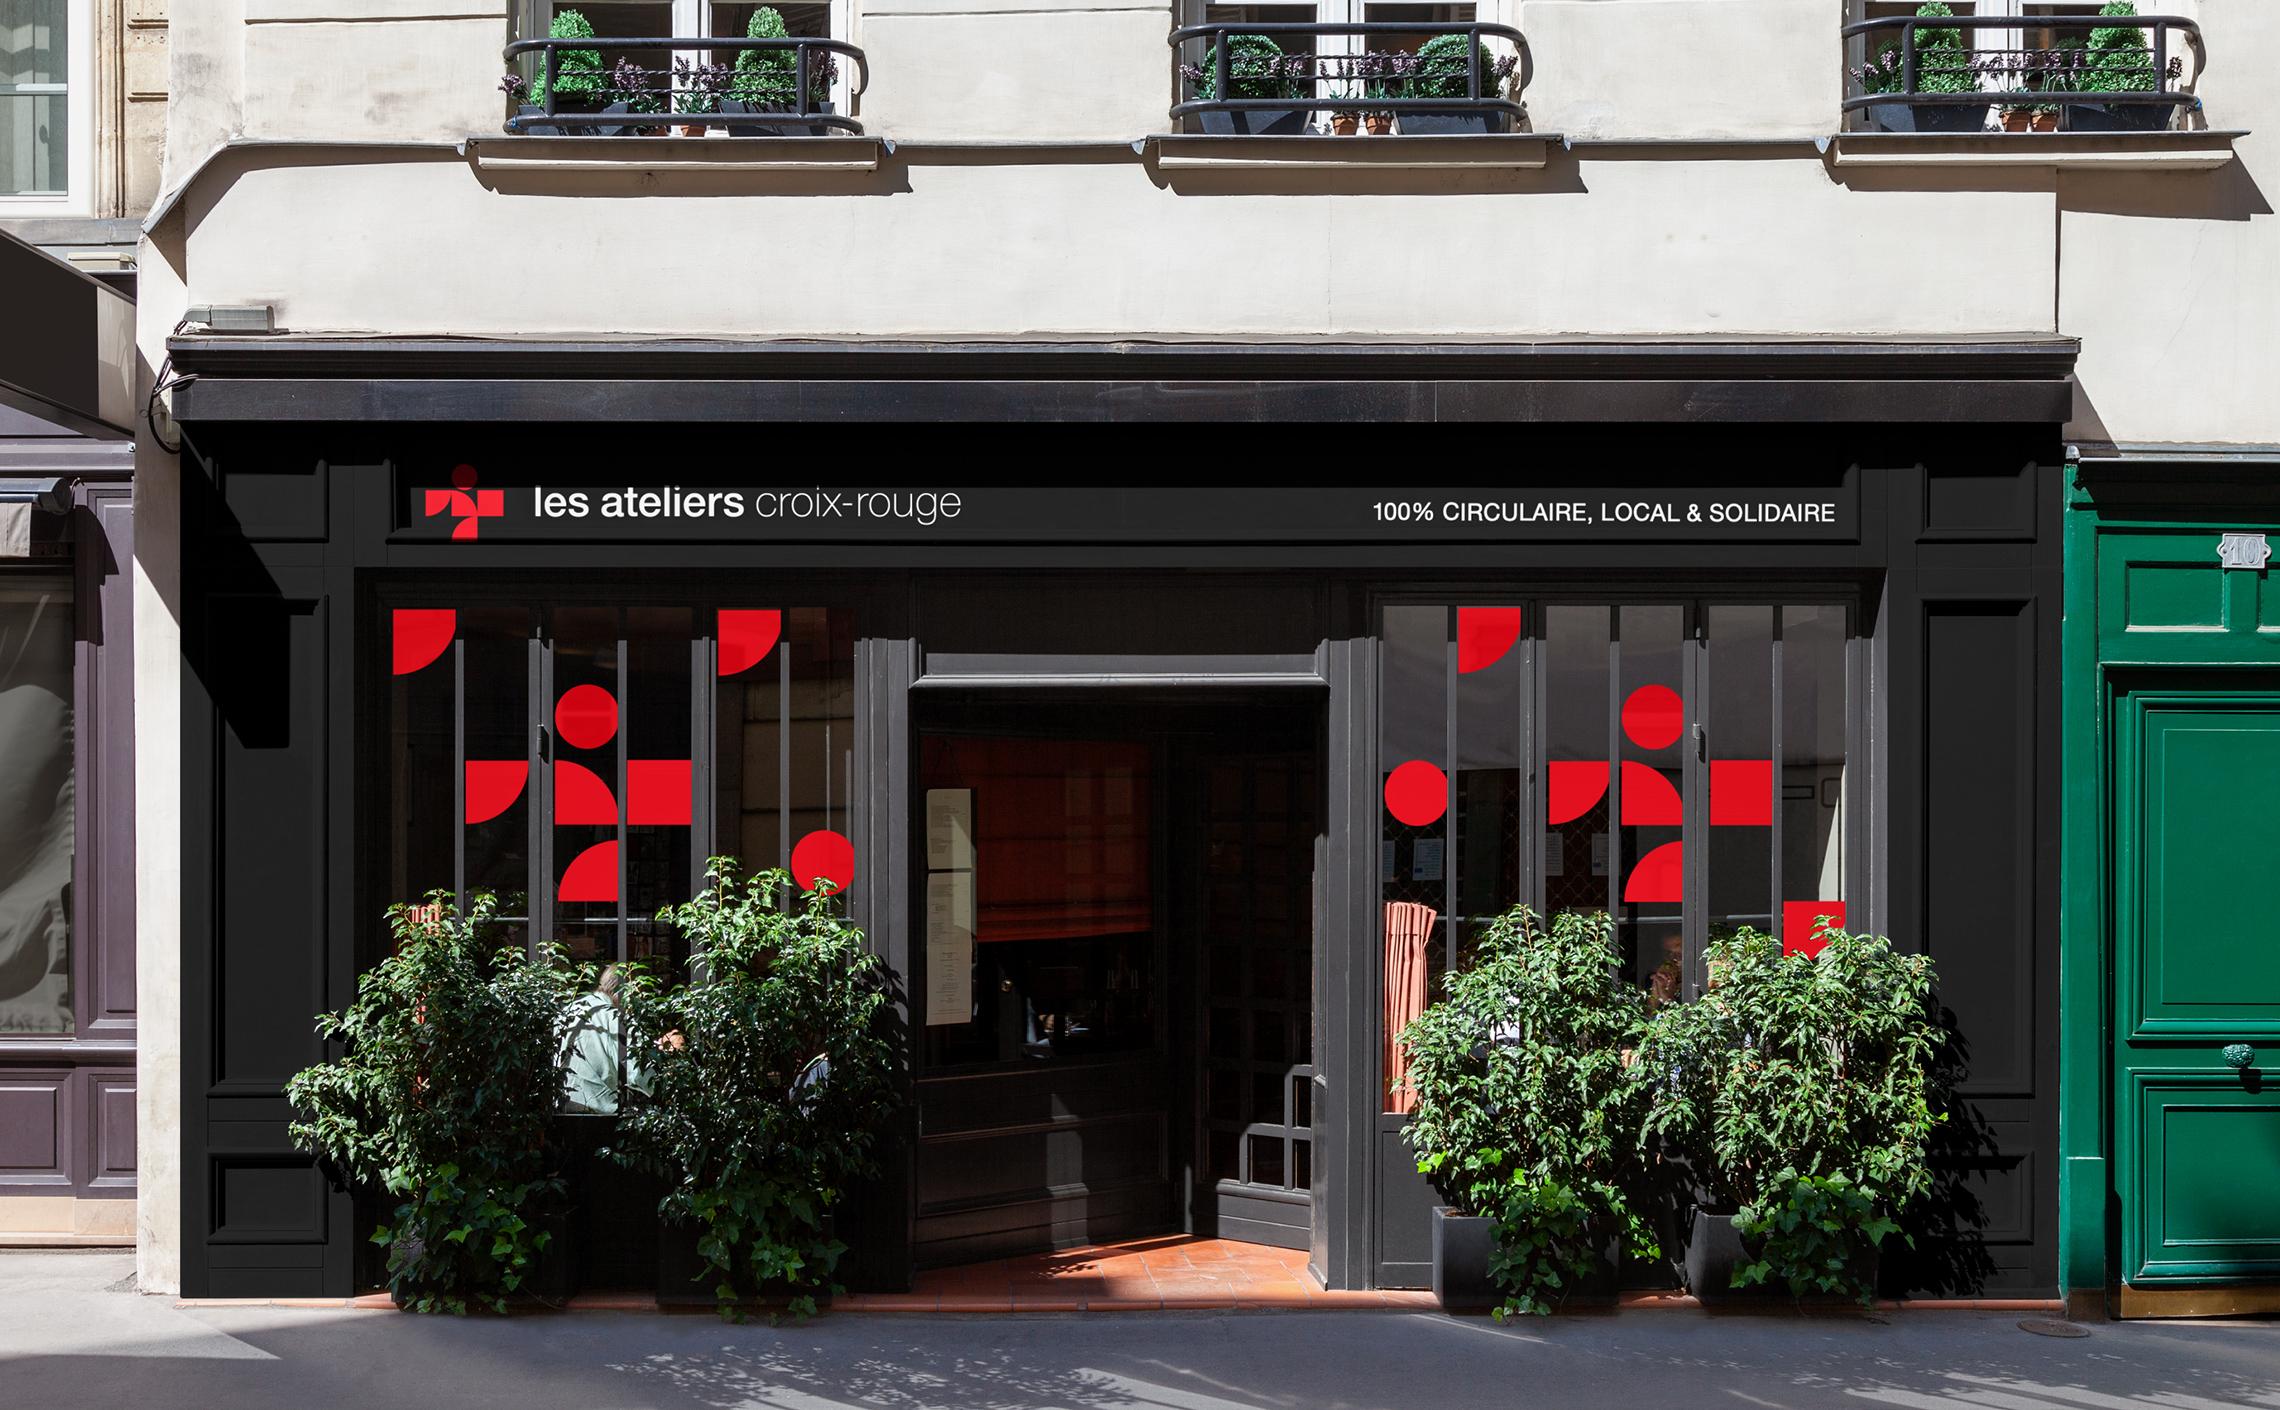 habillage vitrine atelier croix-rouge